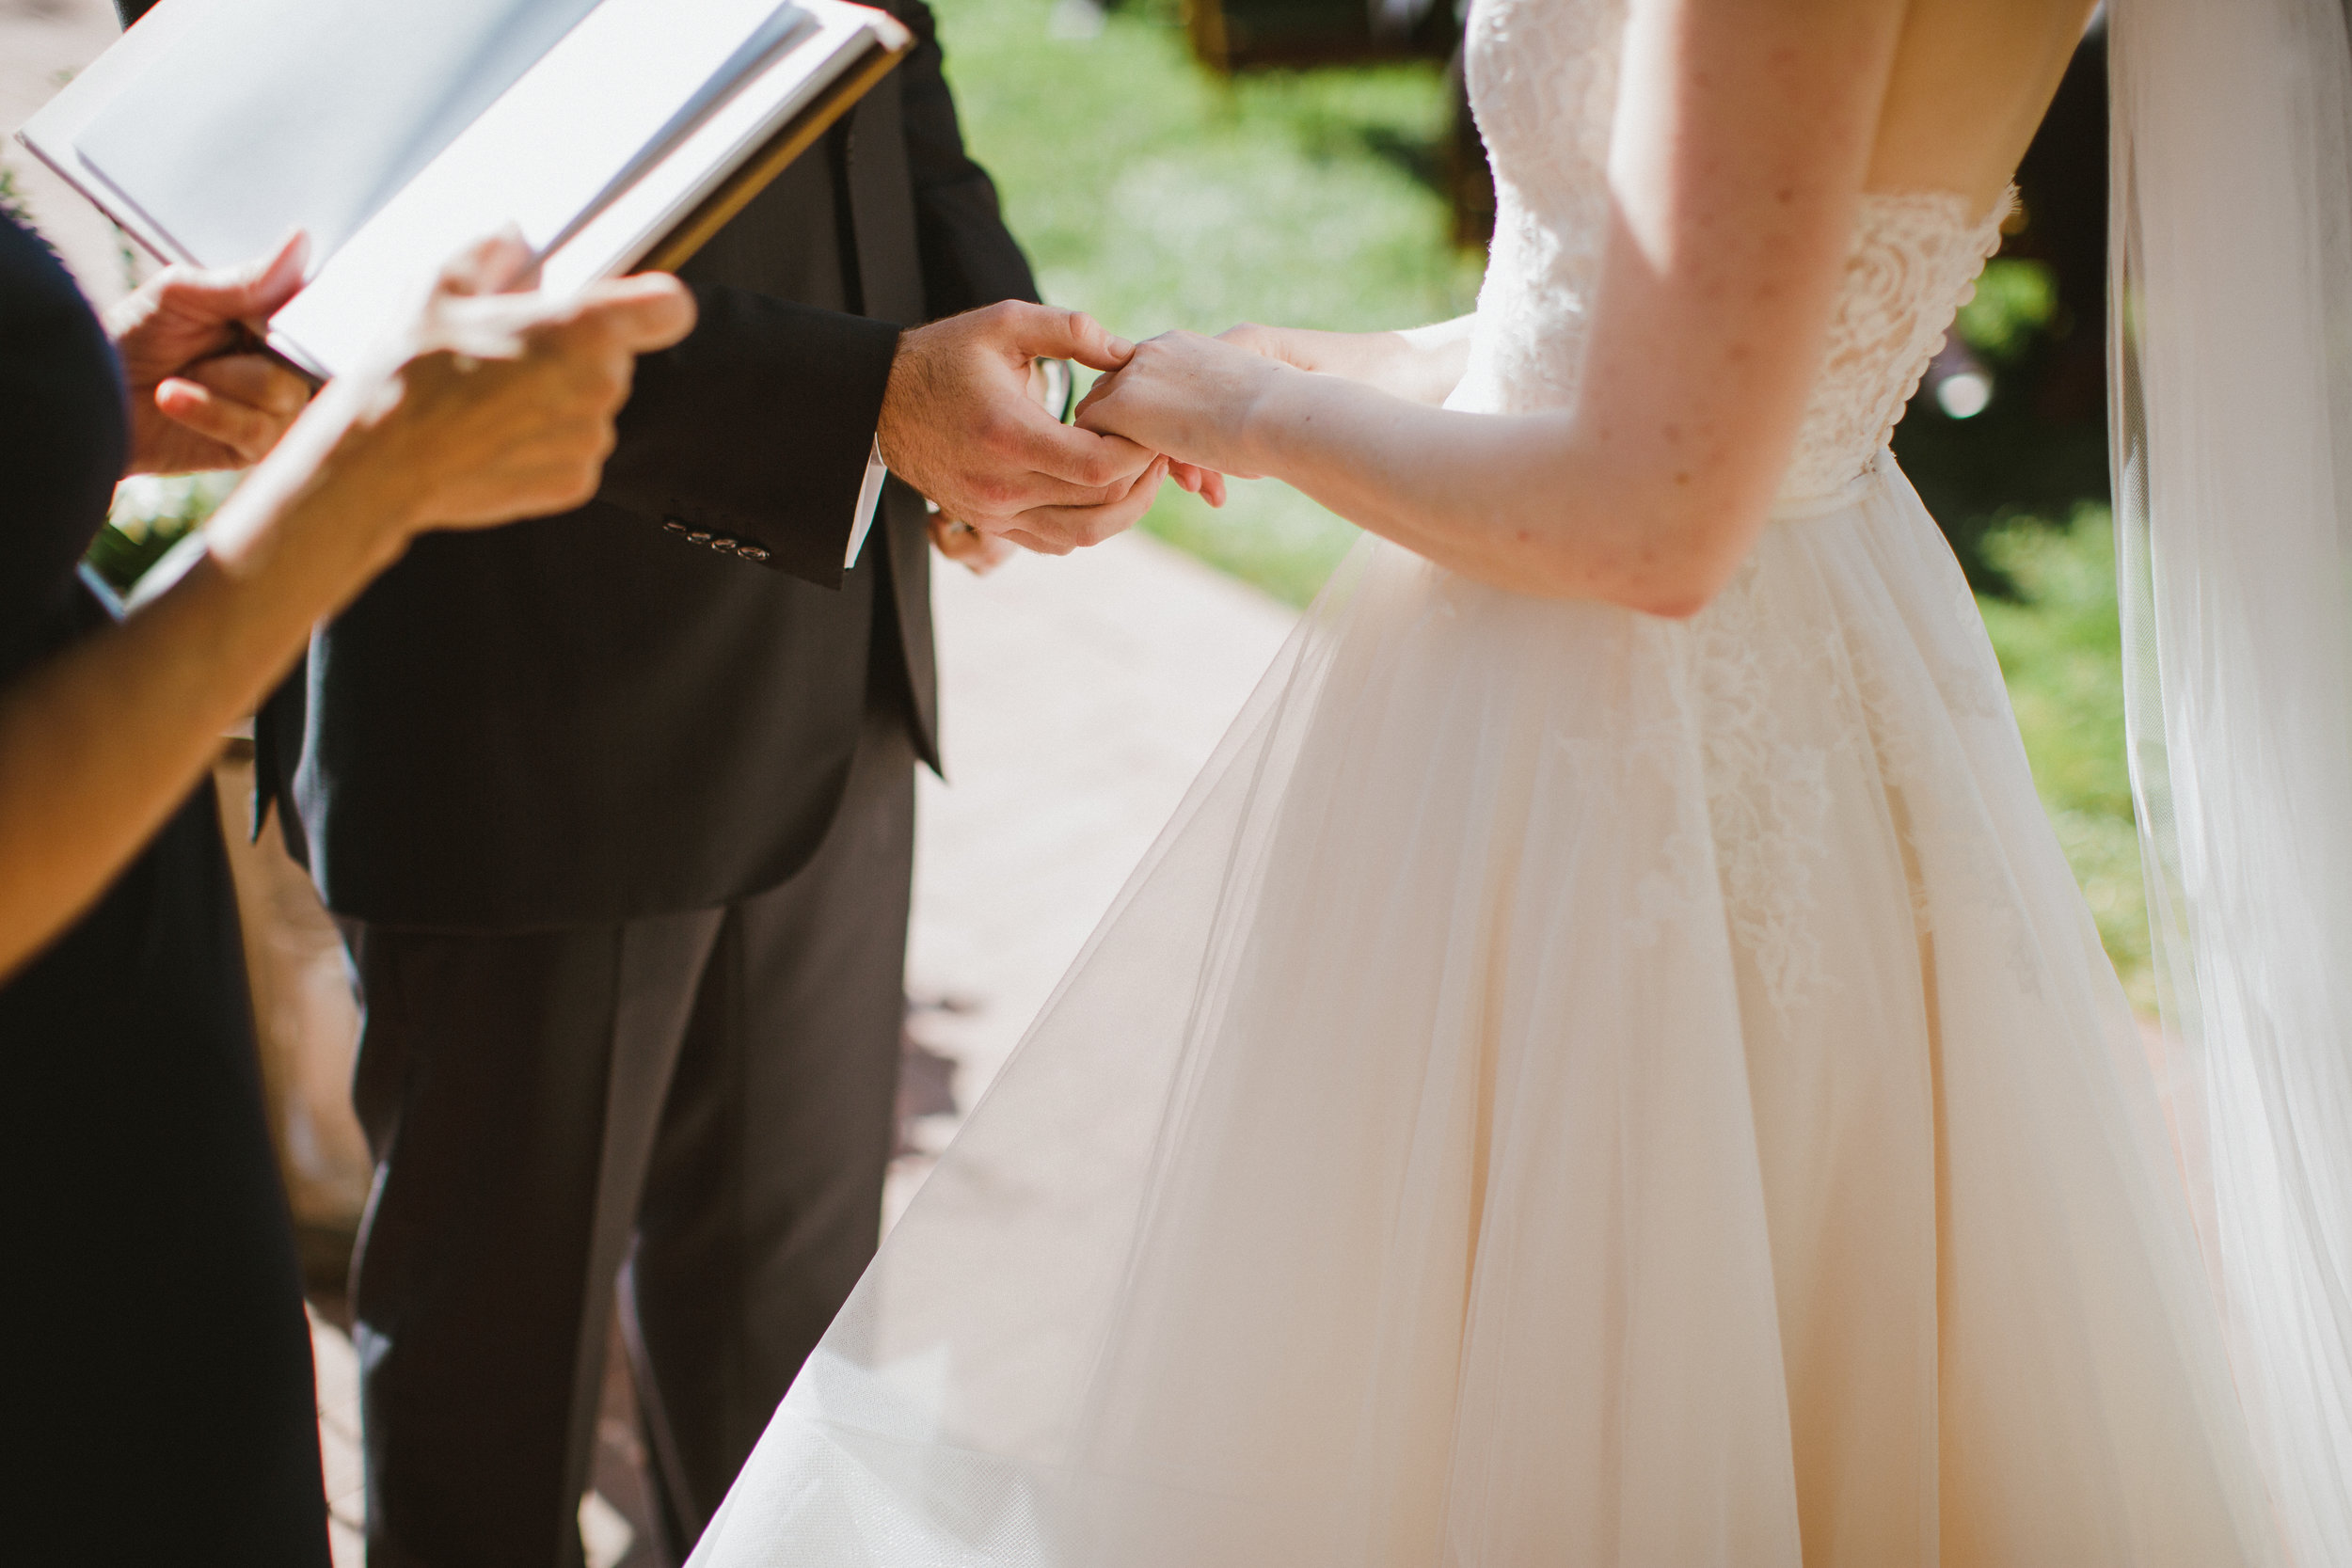 www.santabarbarawedding.com | Ryanne Bee Photography | The Santa Barbara Club | Santa Barbara Classic Weddings | Groom Takes Bride's Hand